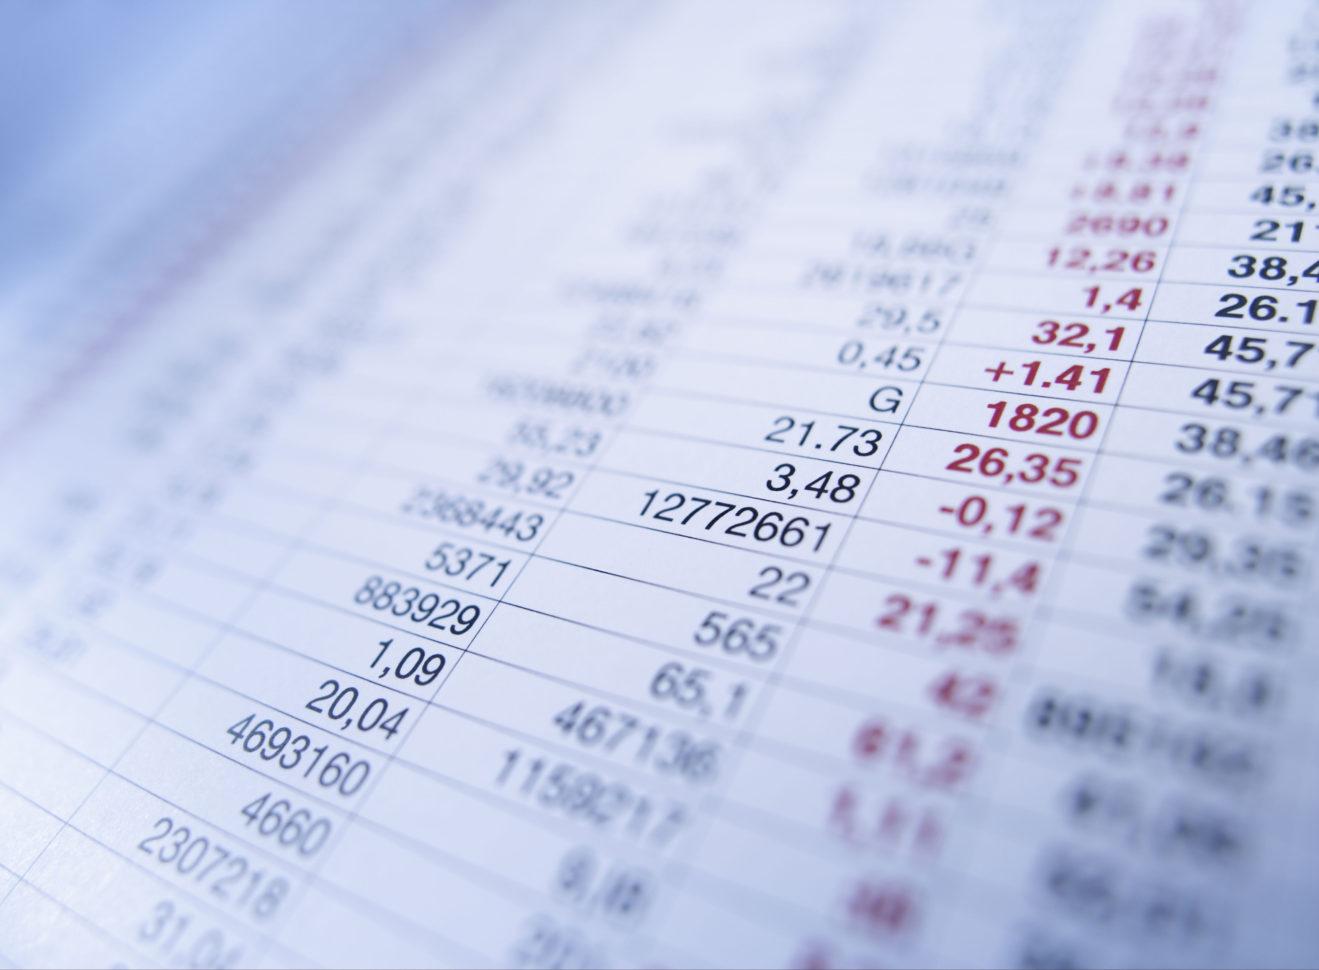 Spreadsheet Alternatives To Excel For 5 Free Spreadsheet Programs